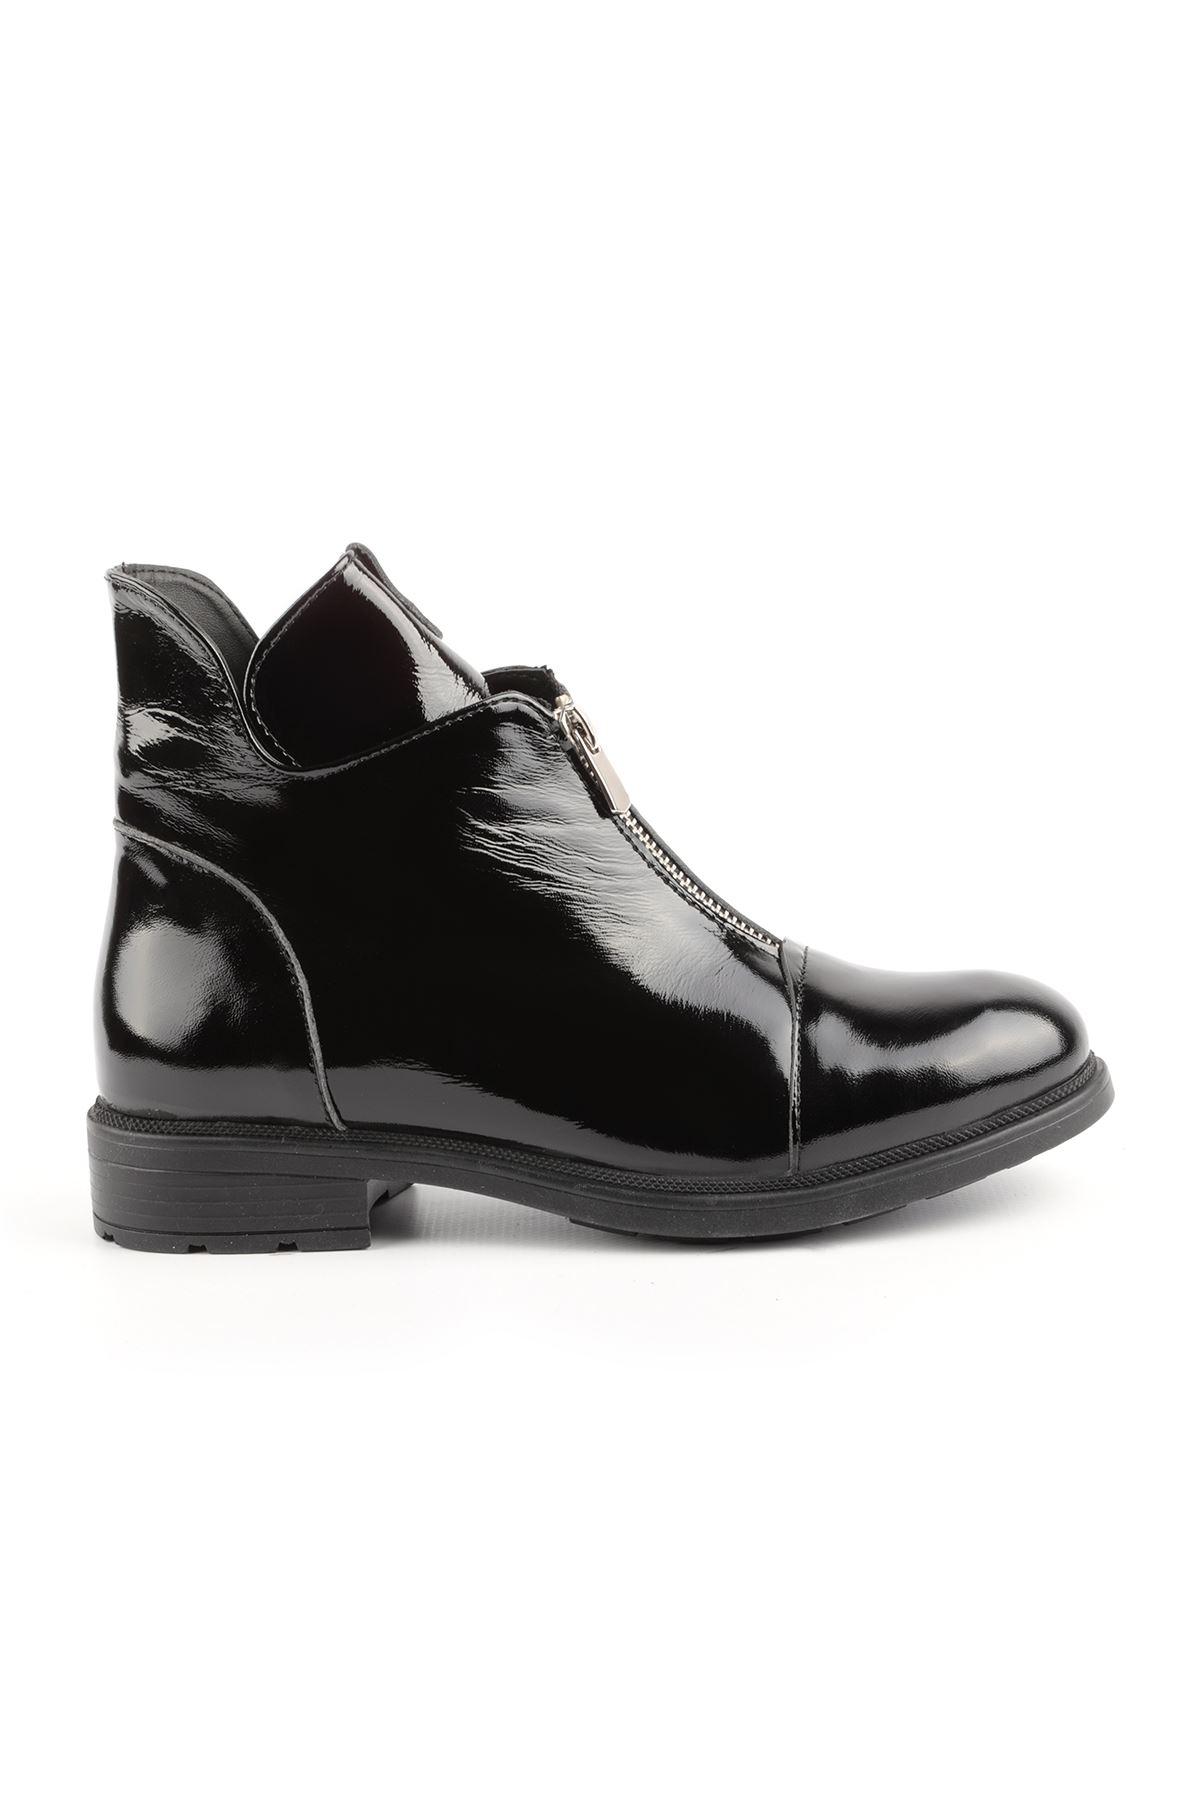 Libero FMS332 Black Patent Leather Boot